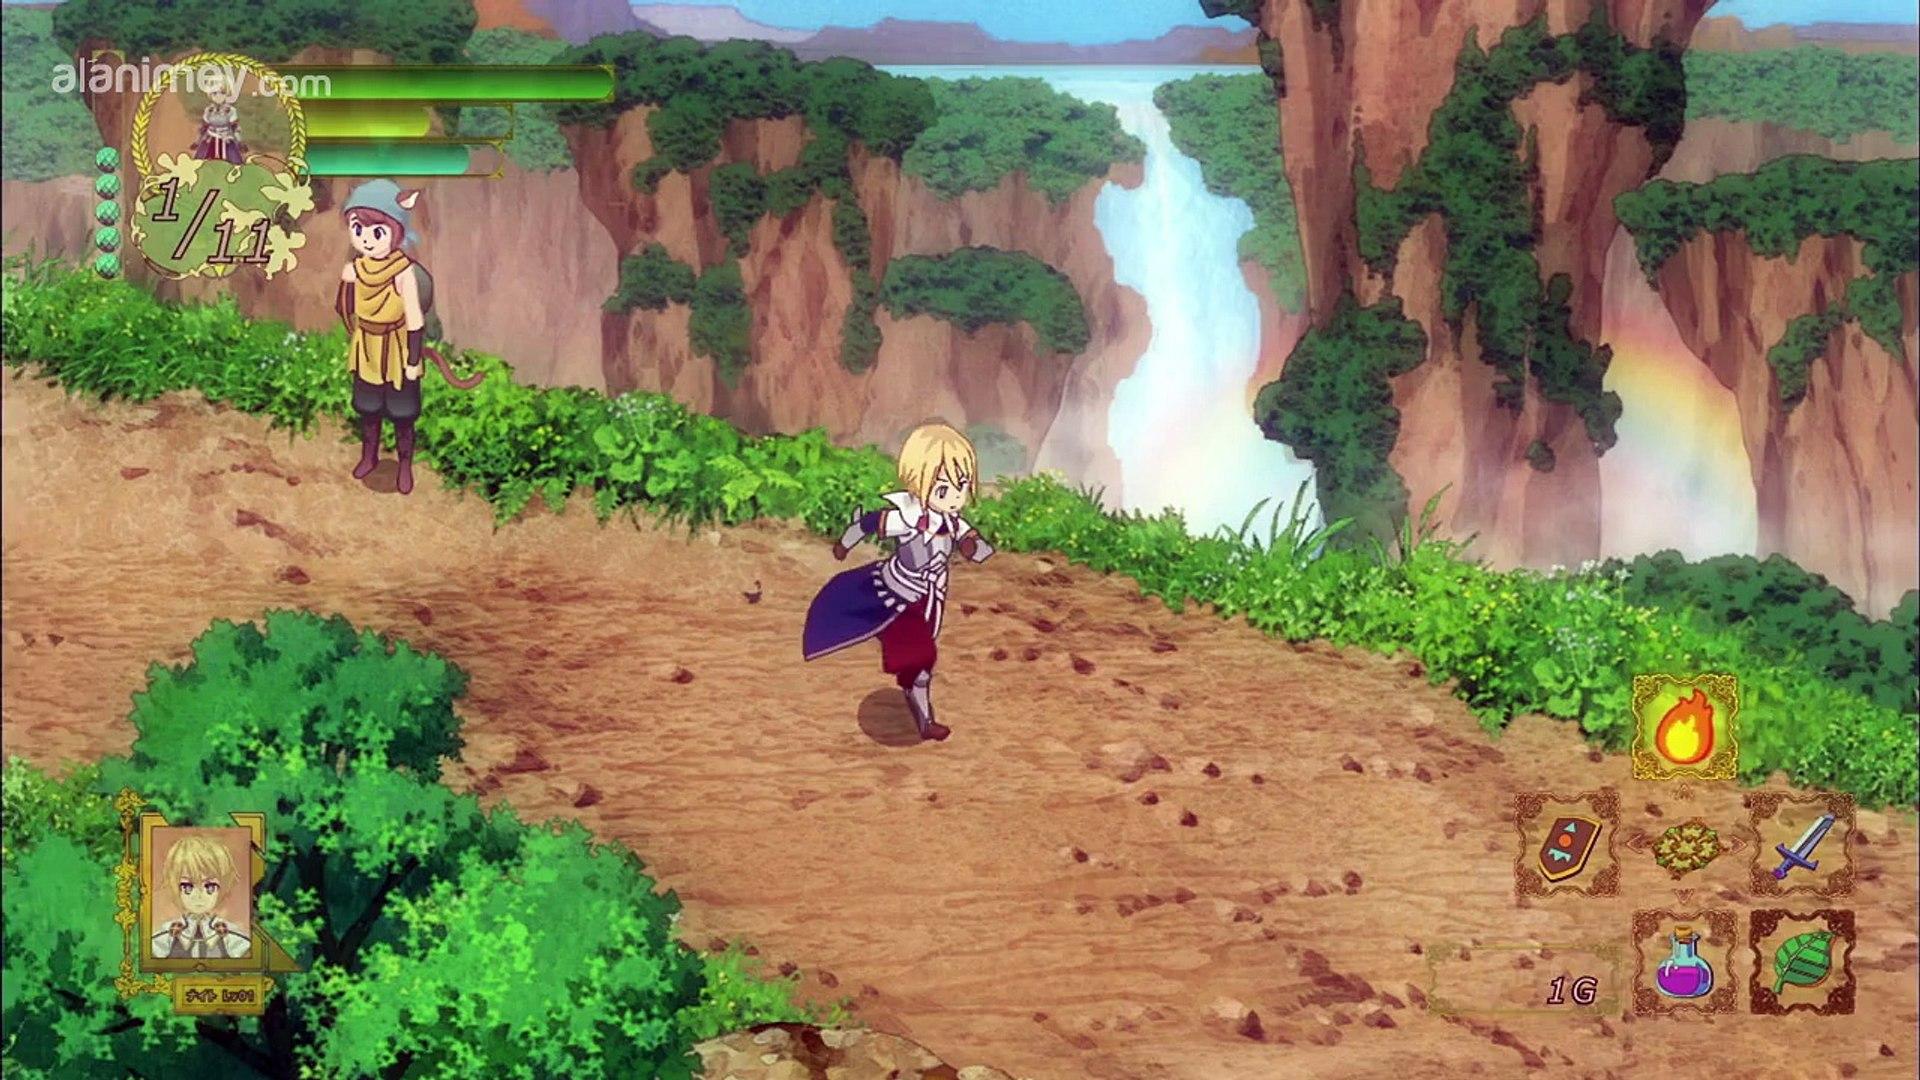 New Game! الحلقة 08 مترجم اون لاين